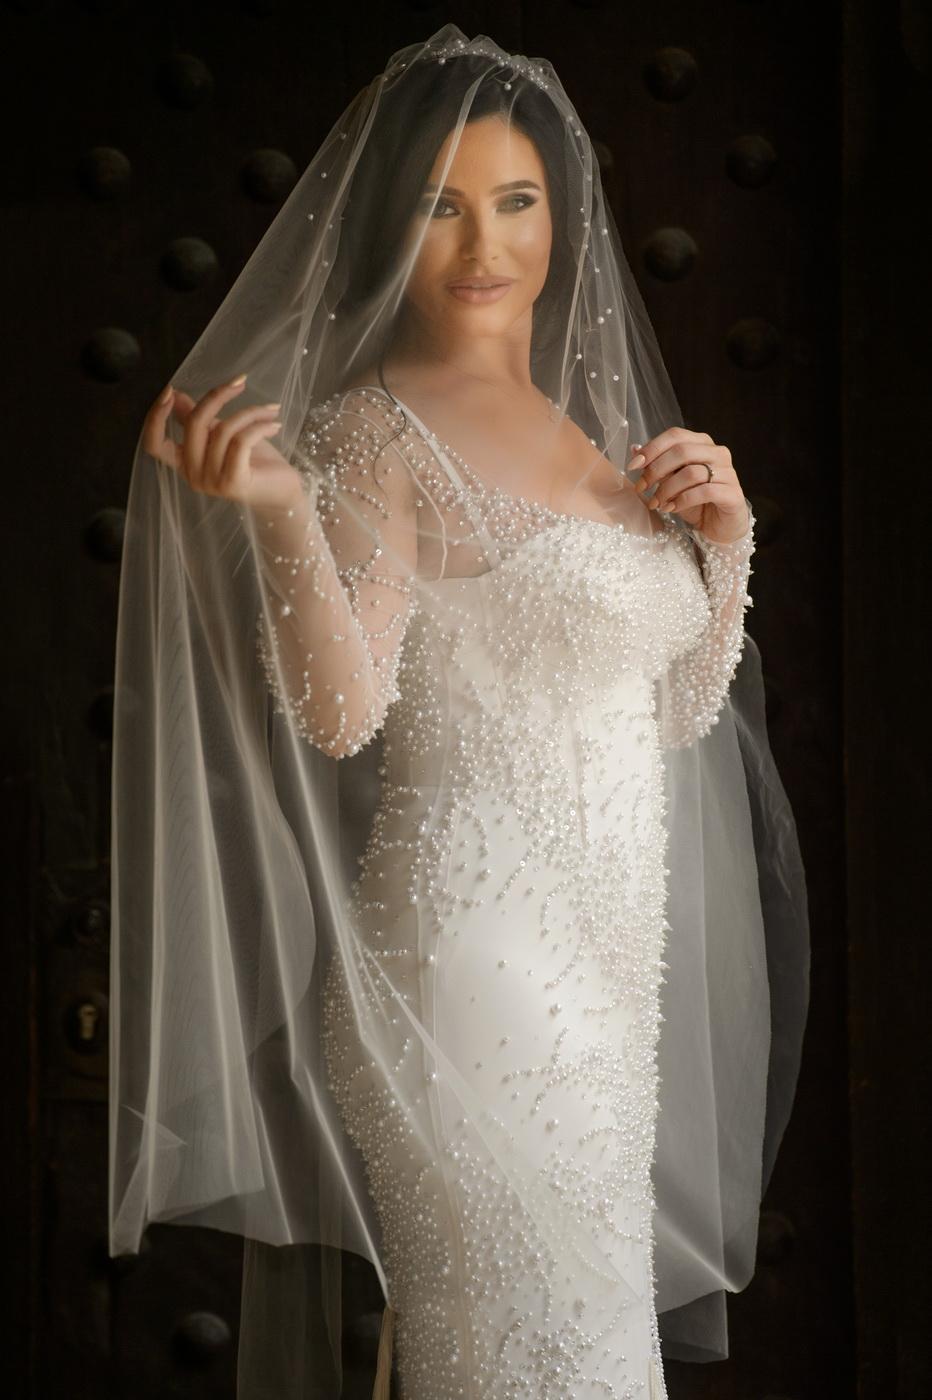 Destination Wedding Photographer_Marian Sterea_154.jpg